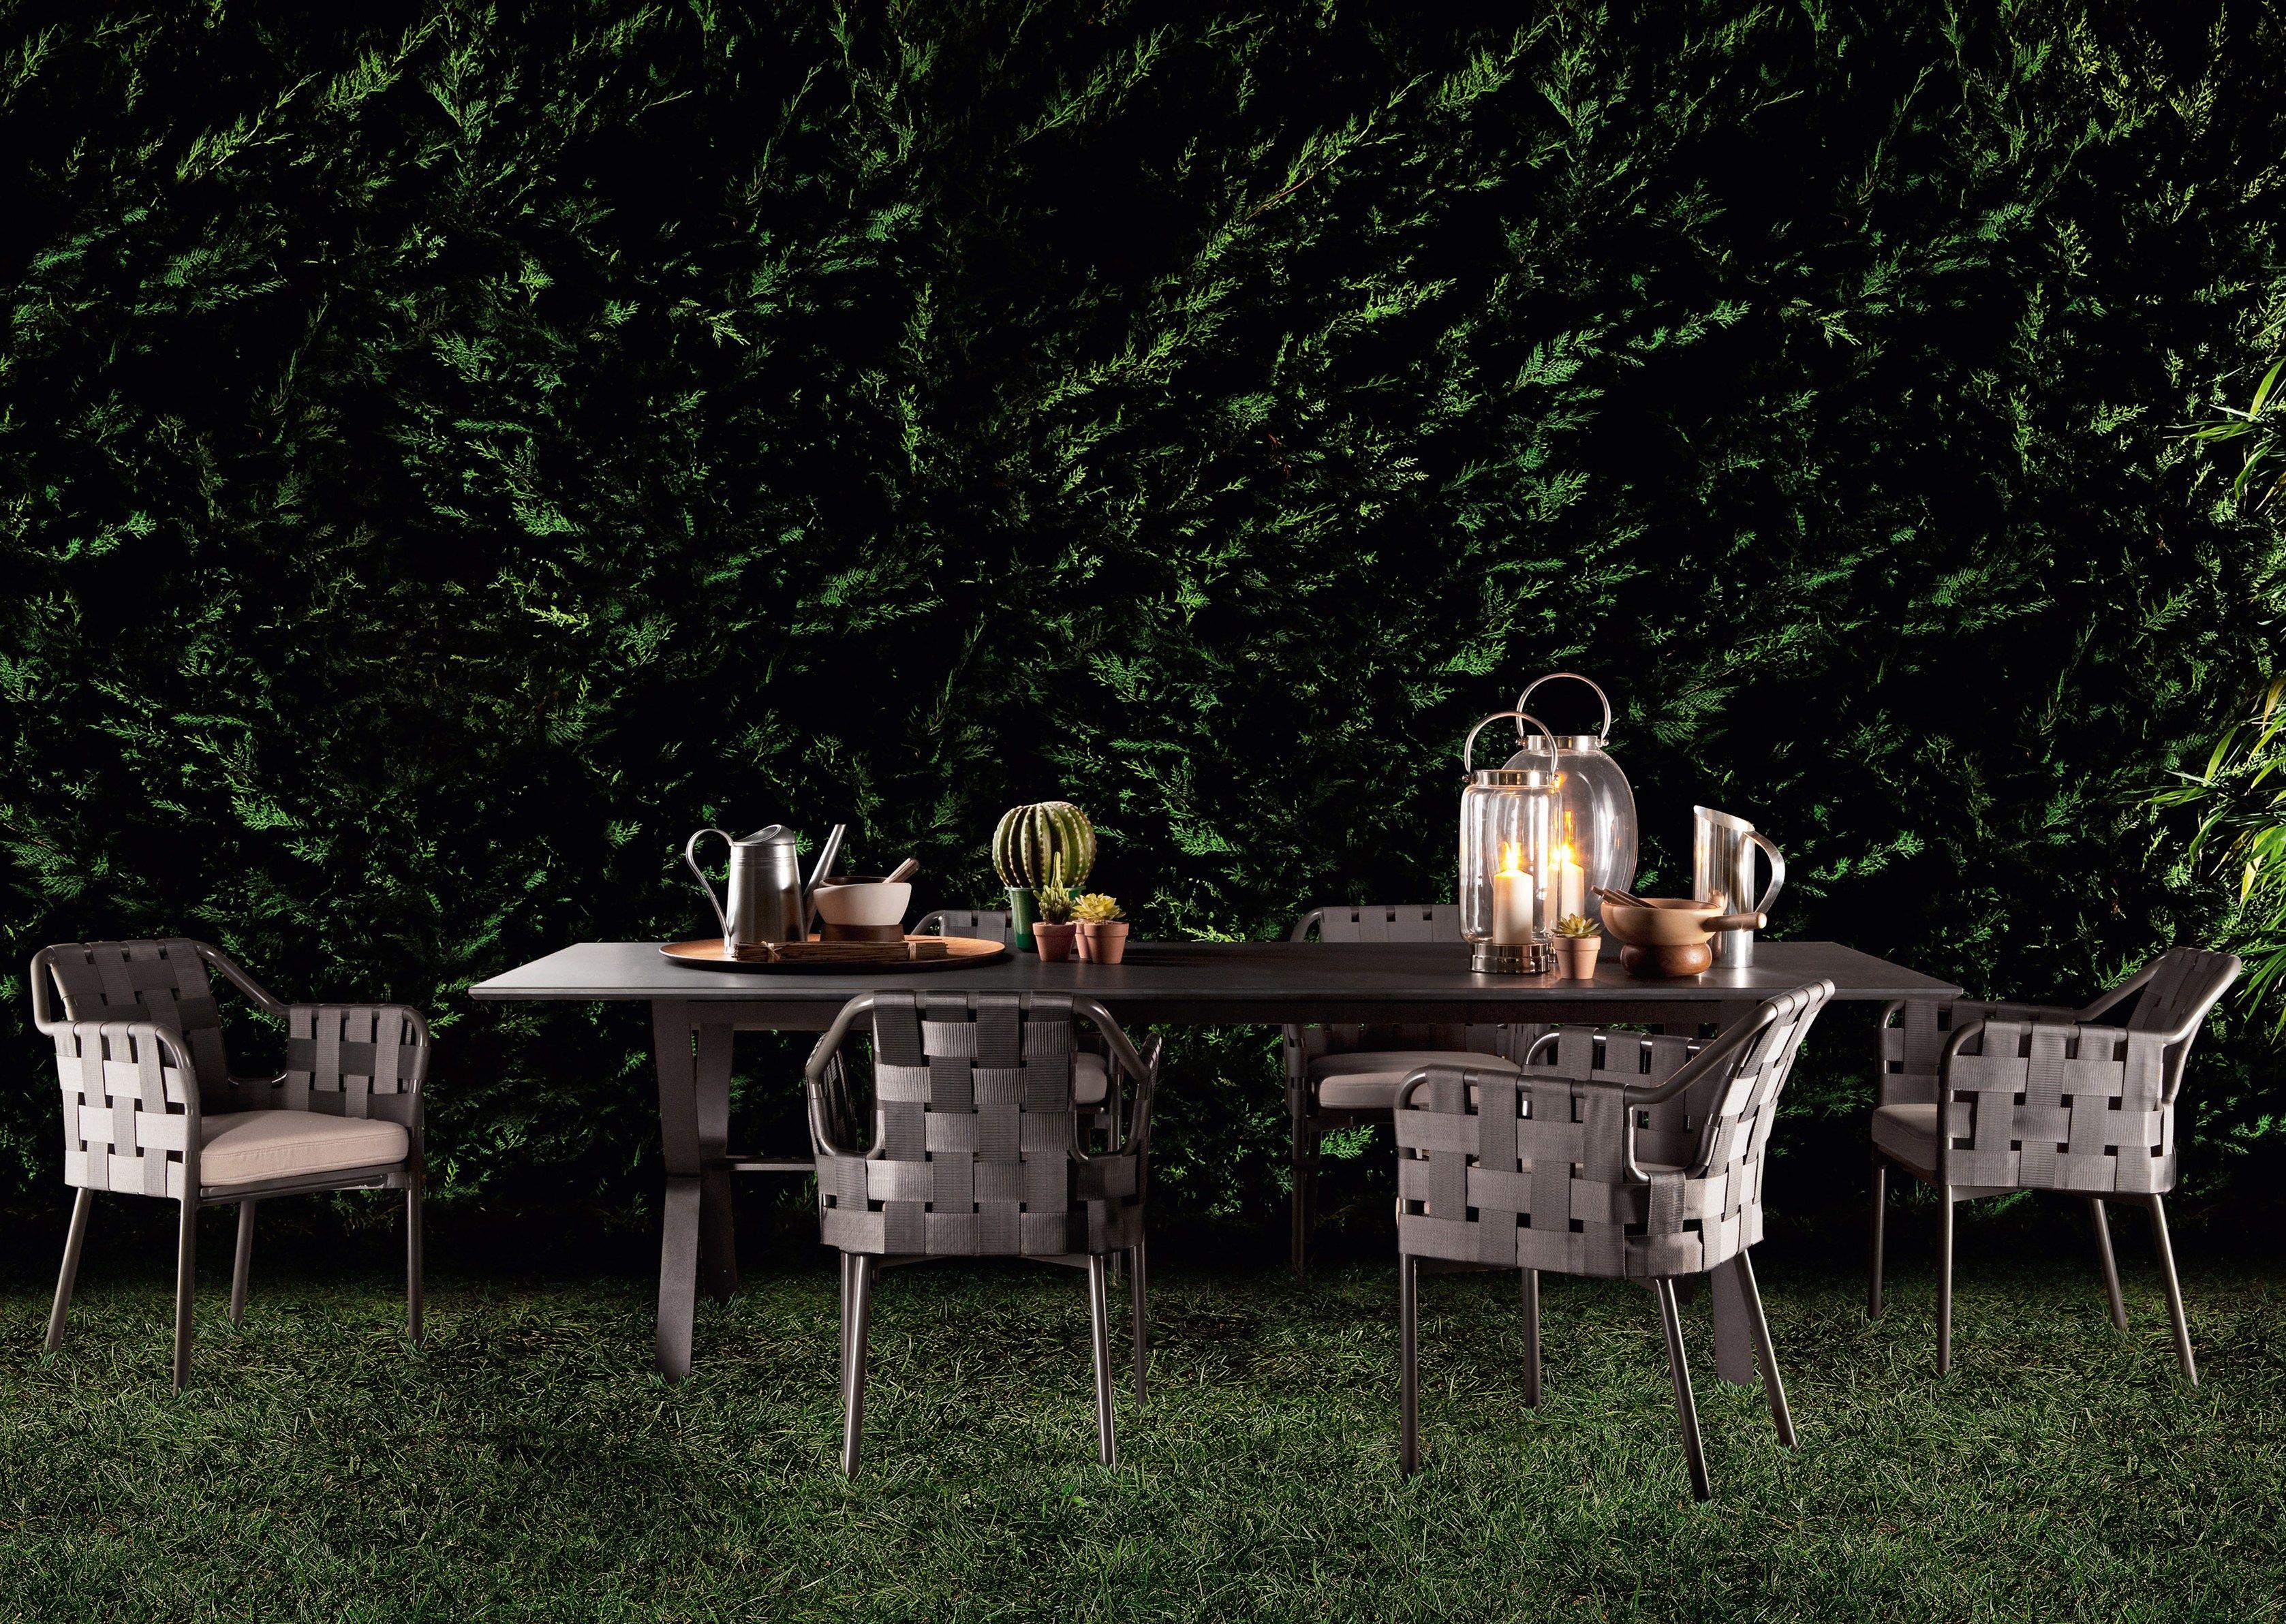 arredo giardino obi - 28 images - arredo giardino obi with arredo ...